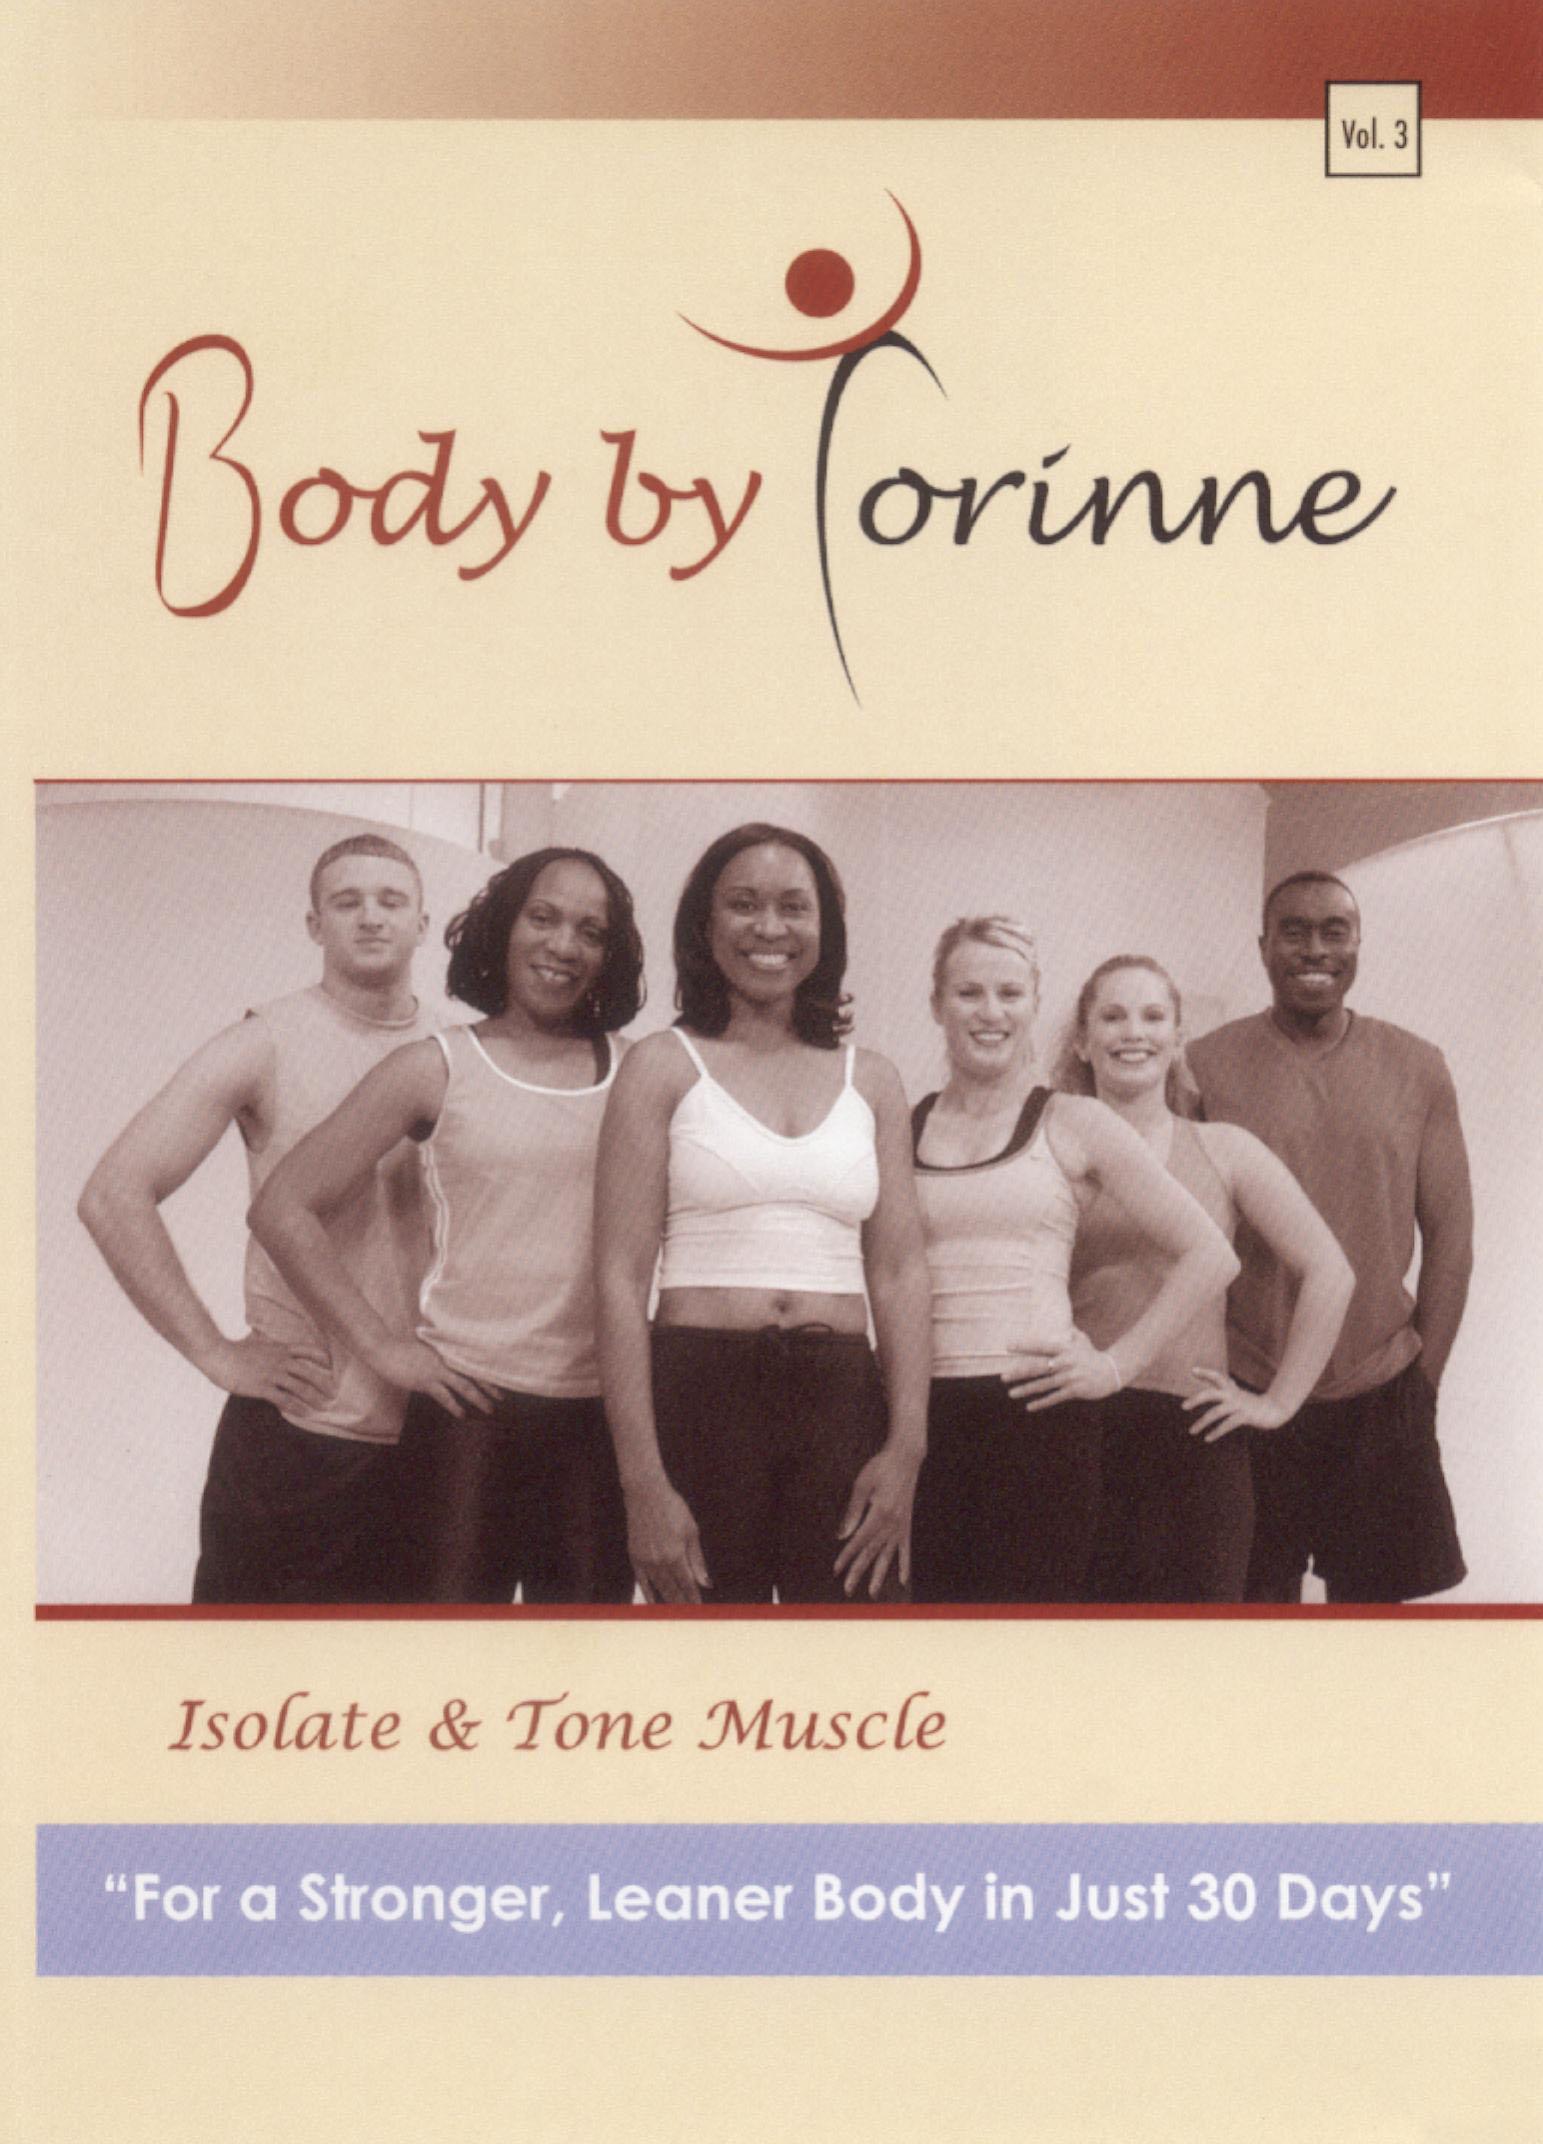 Body By Corinne, Vol. 3